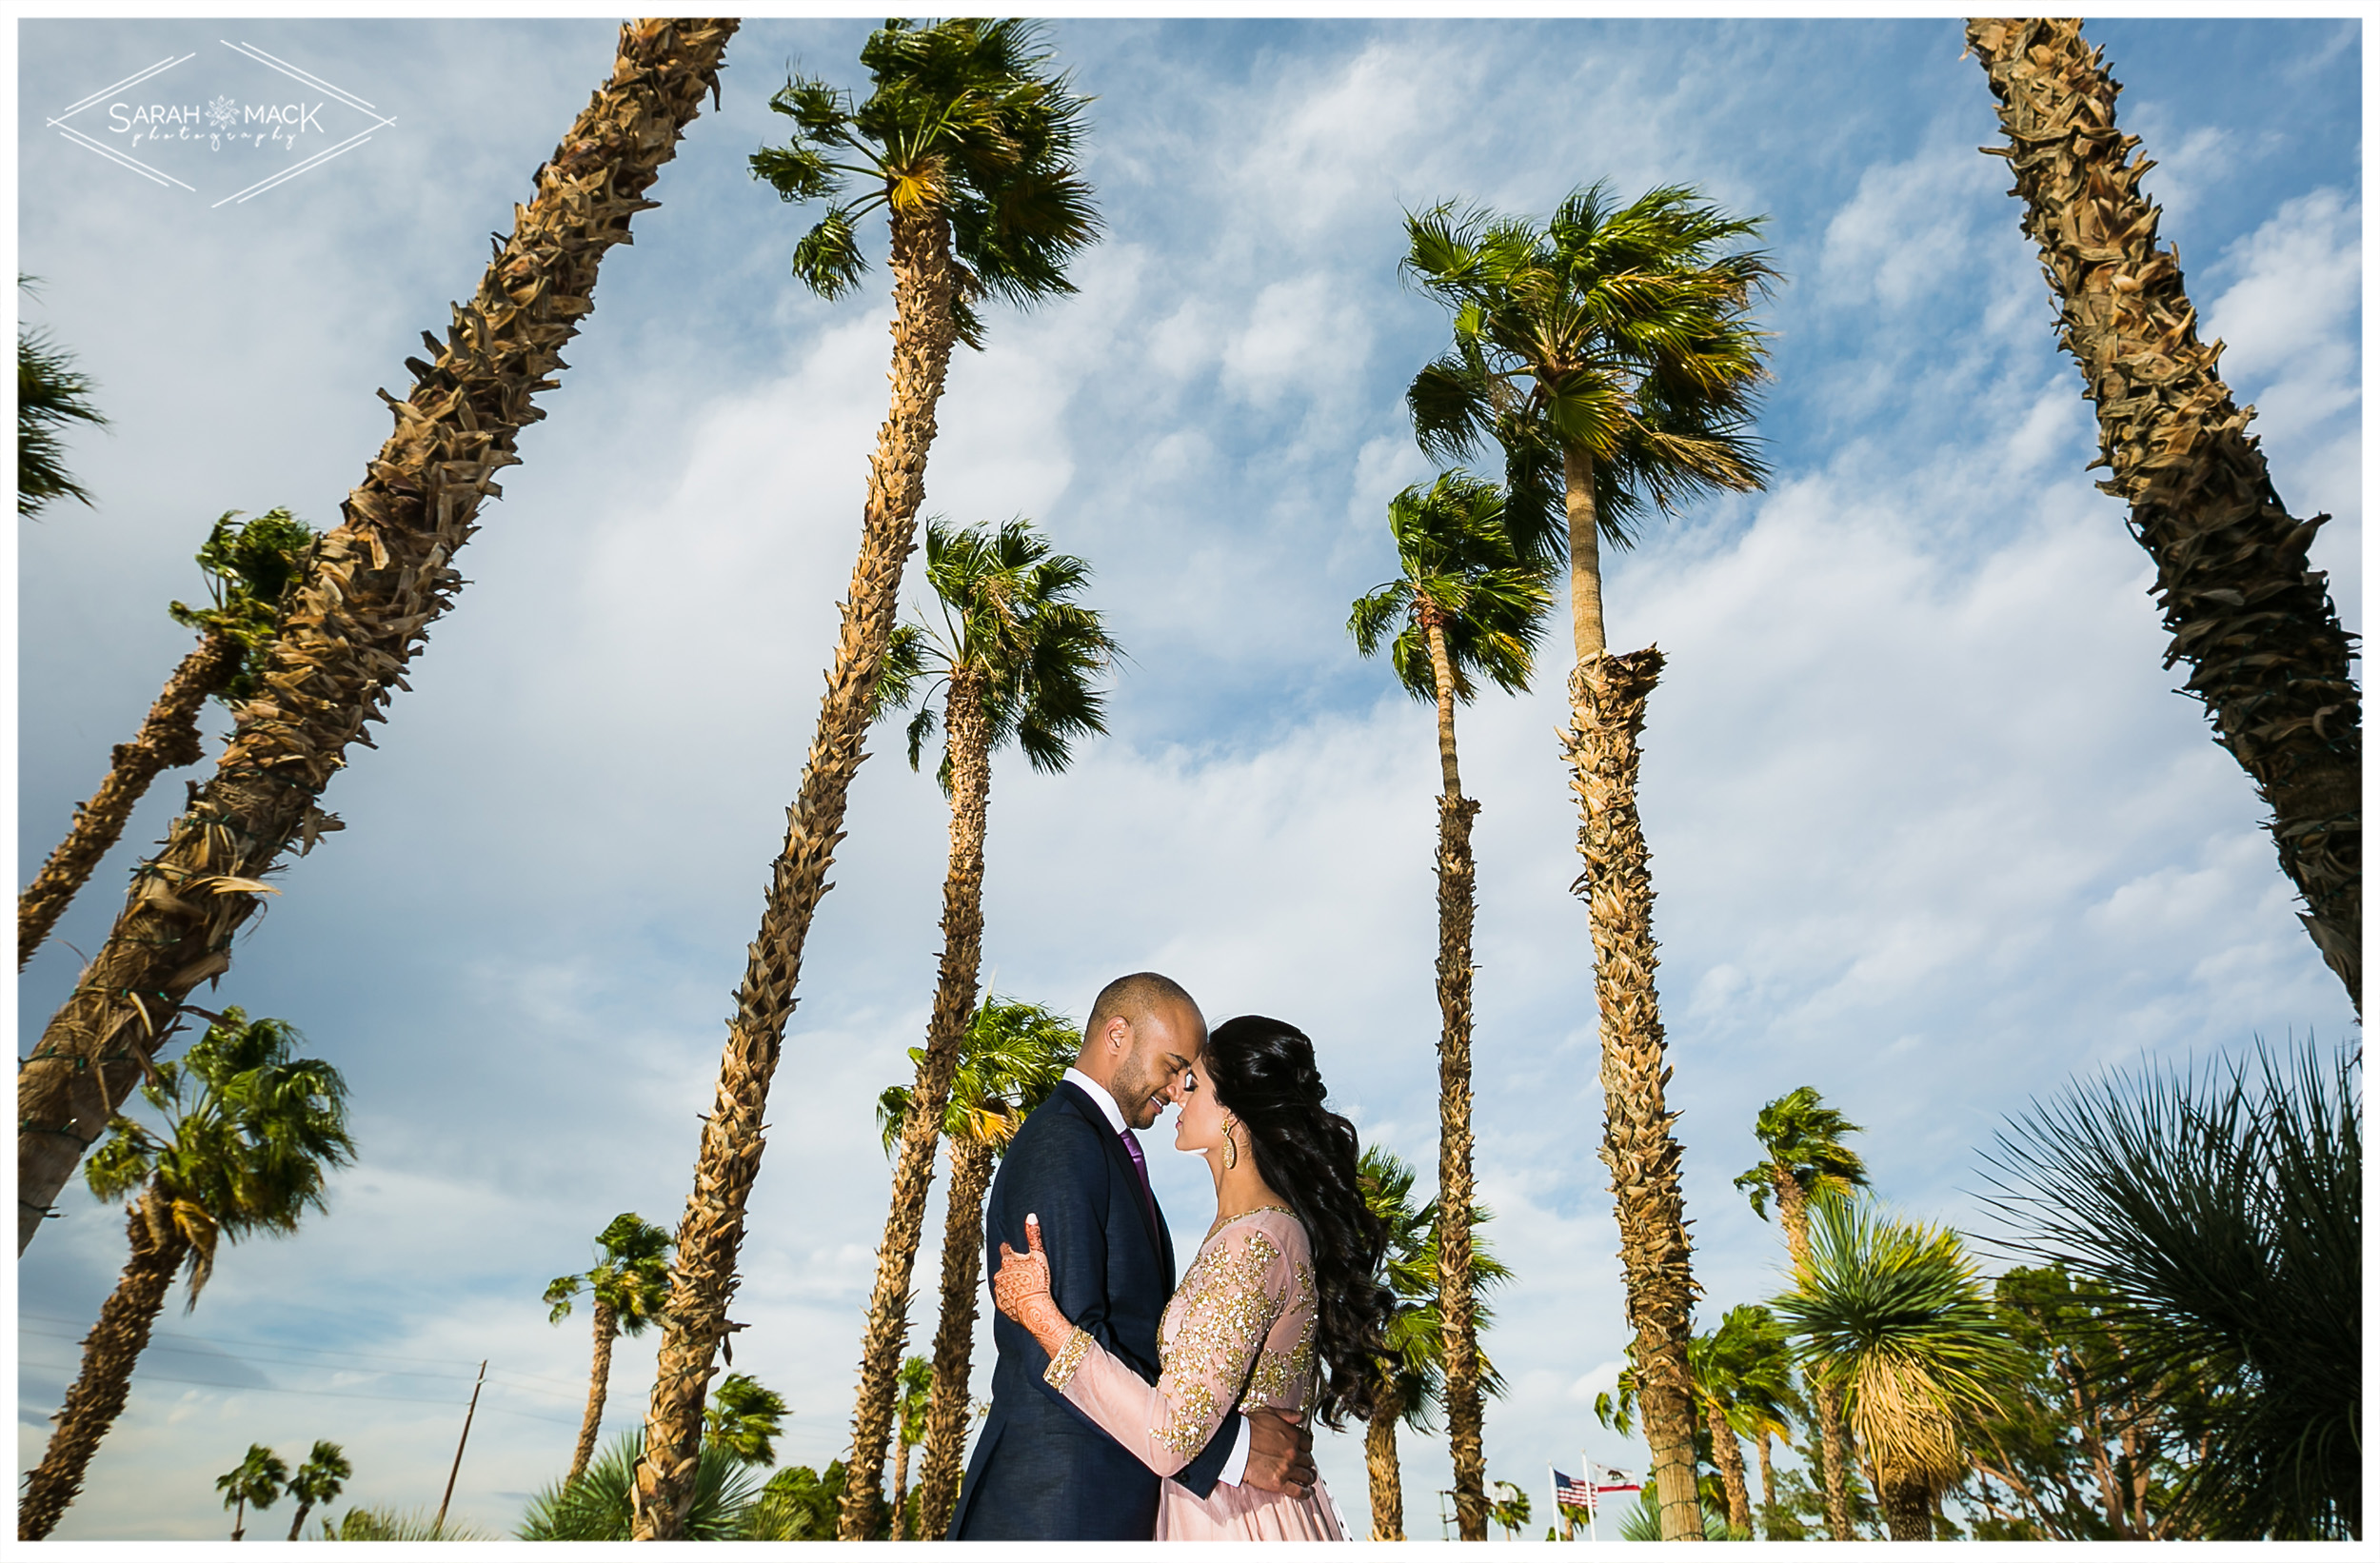 PR-Double-Tree-Hilton-Palm-Springs-Indian-Wedding-3.jpg